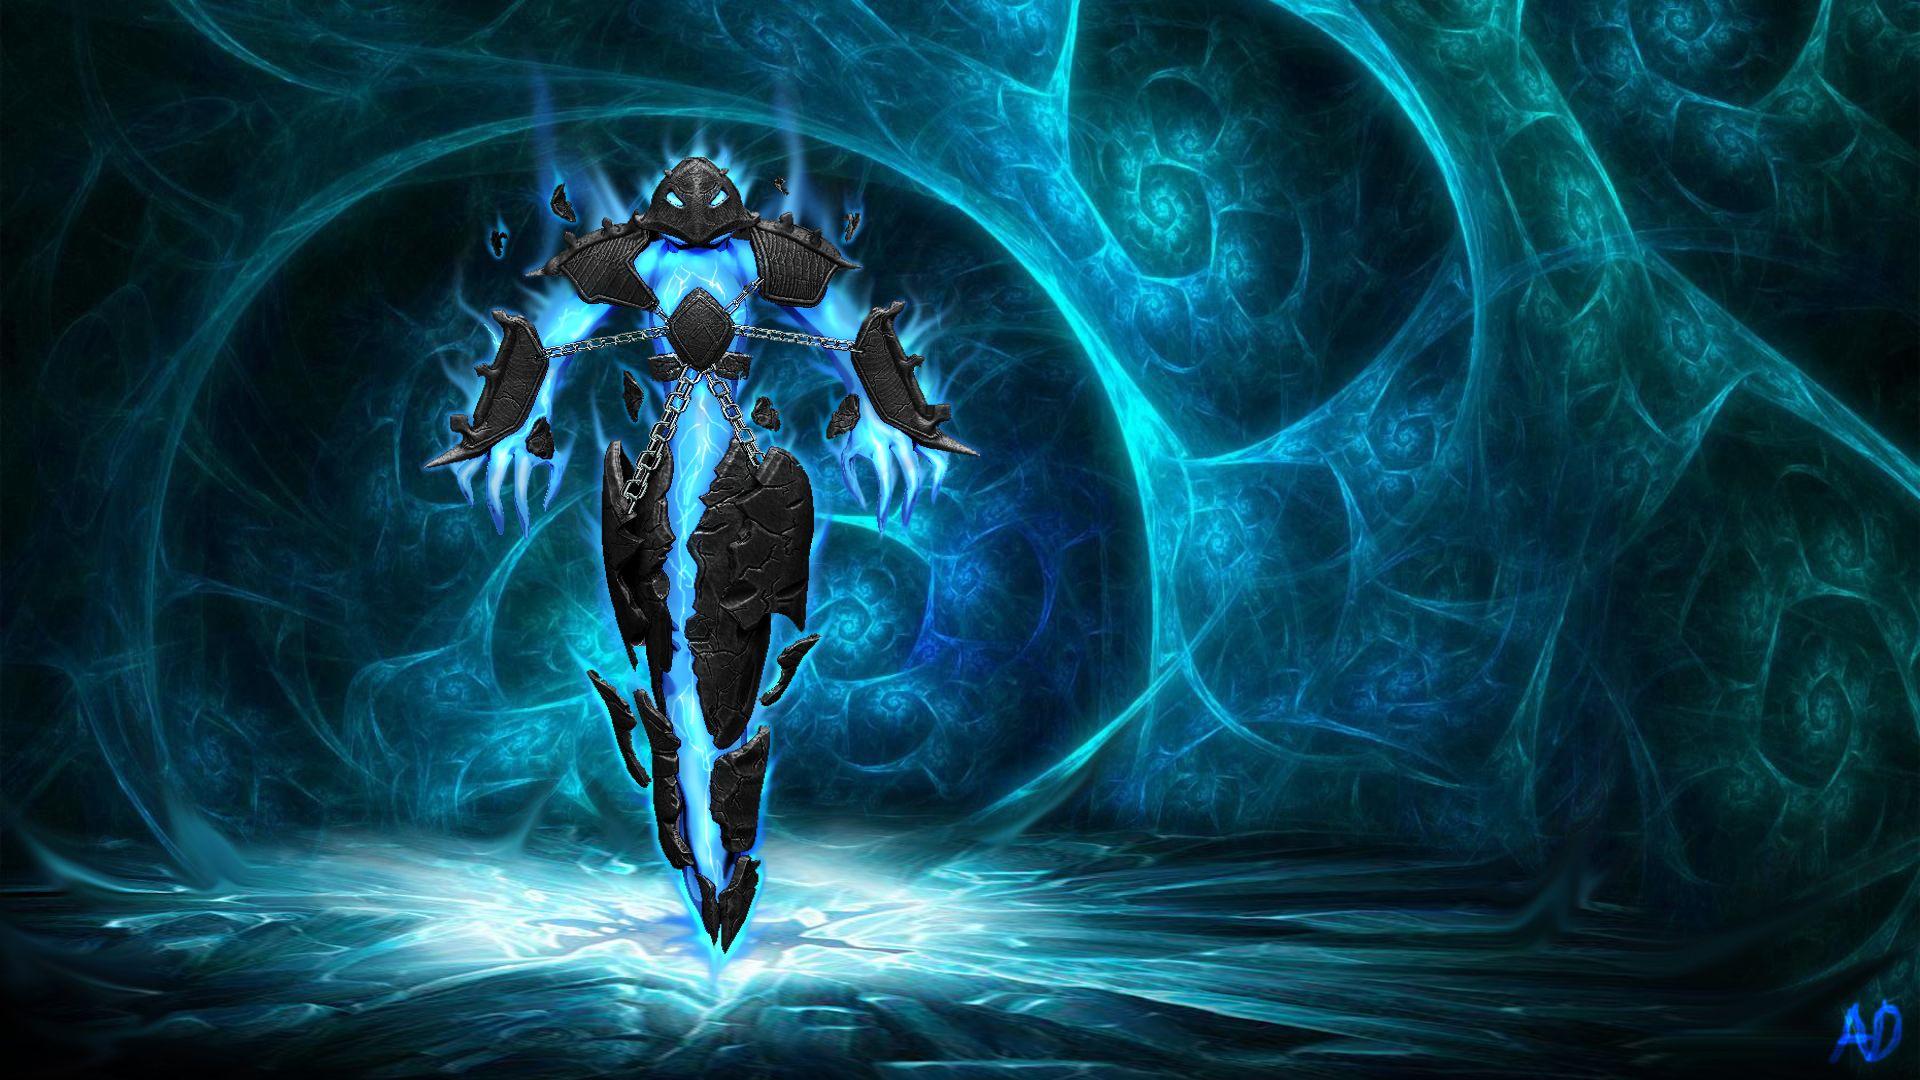 Xerath+League+Of+Legends+wallpaper Animais, Campeão